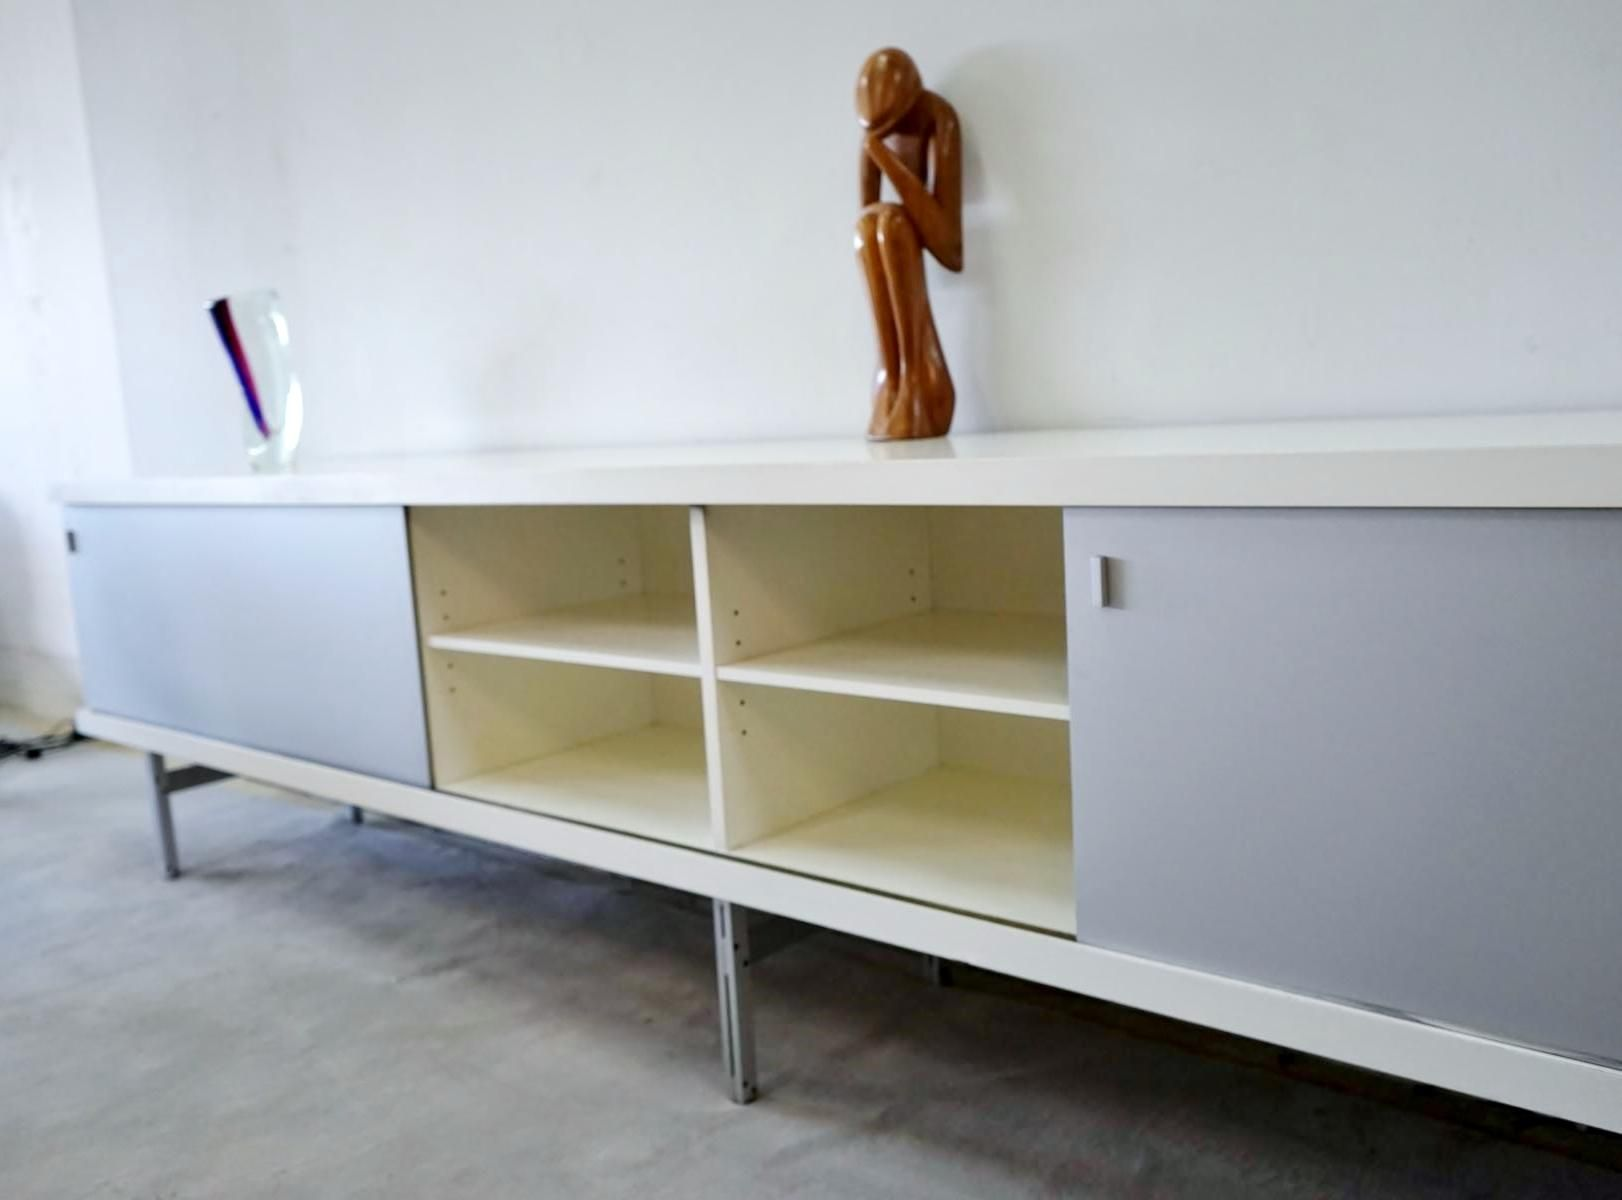 Modell 1730 sideboard von horst br ning f r behr 1960er for Sideboard untergestell